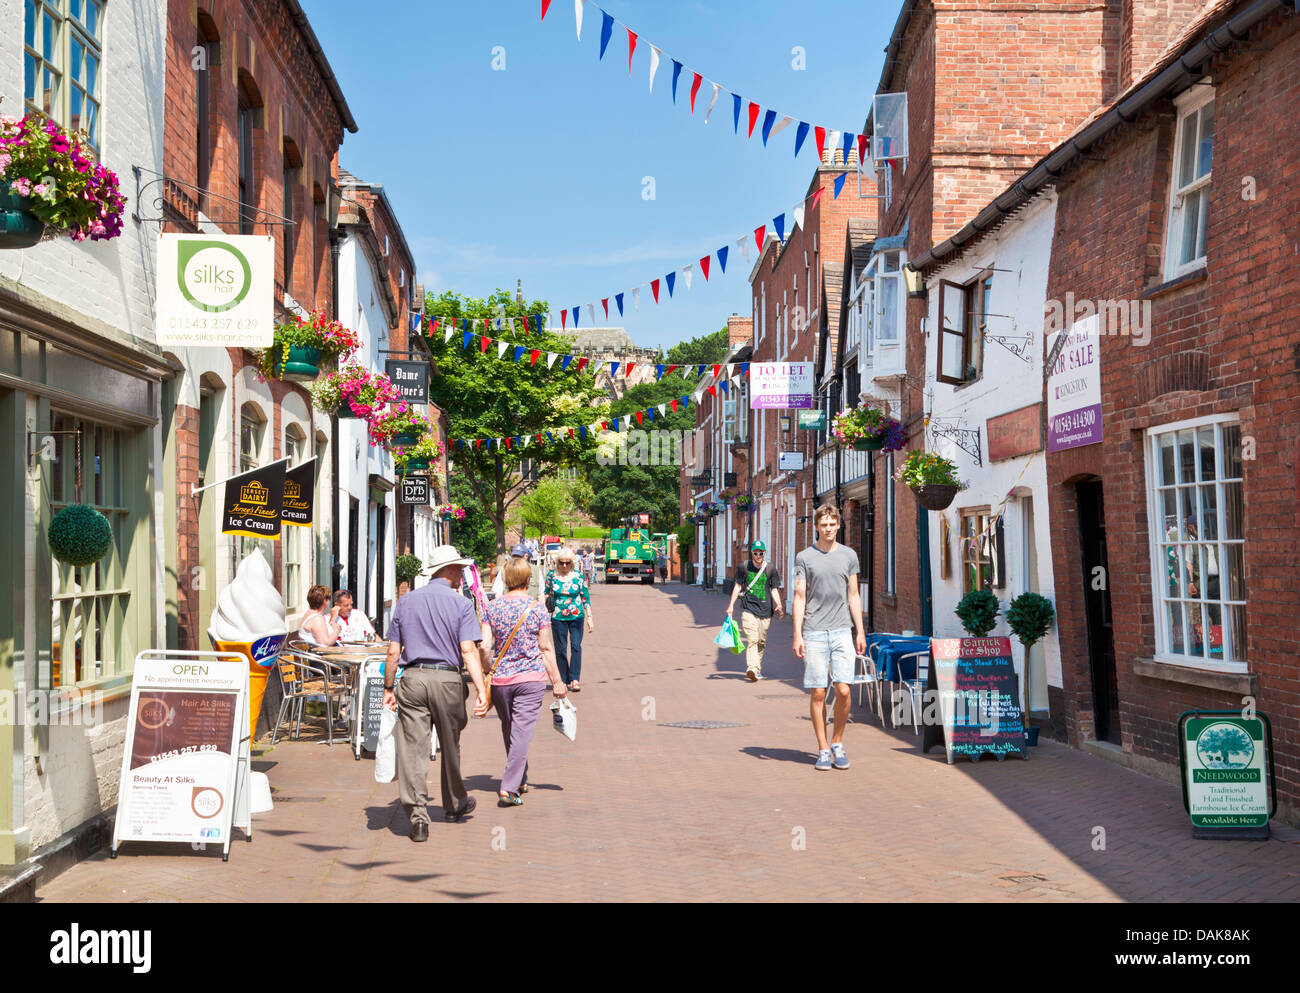 Historic buildings shops and cafes Dam street Lichfield Staffordshire England UK GB EU Europe - Stock Image